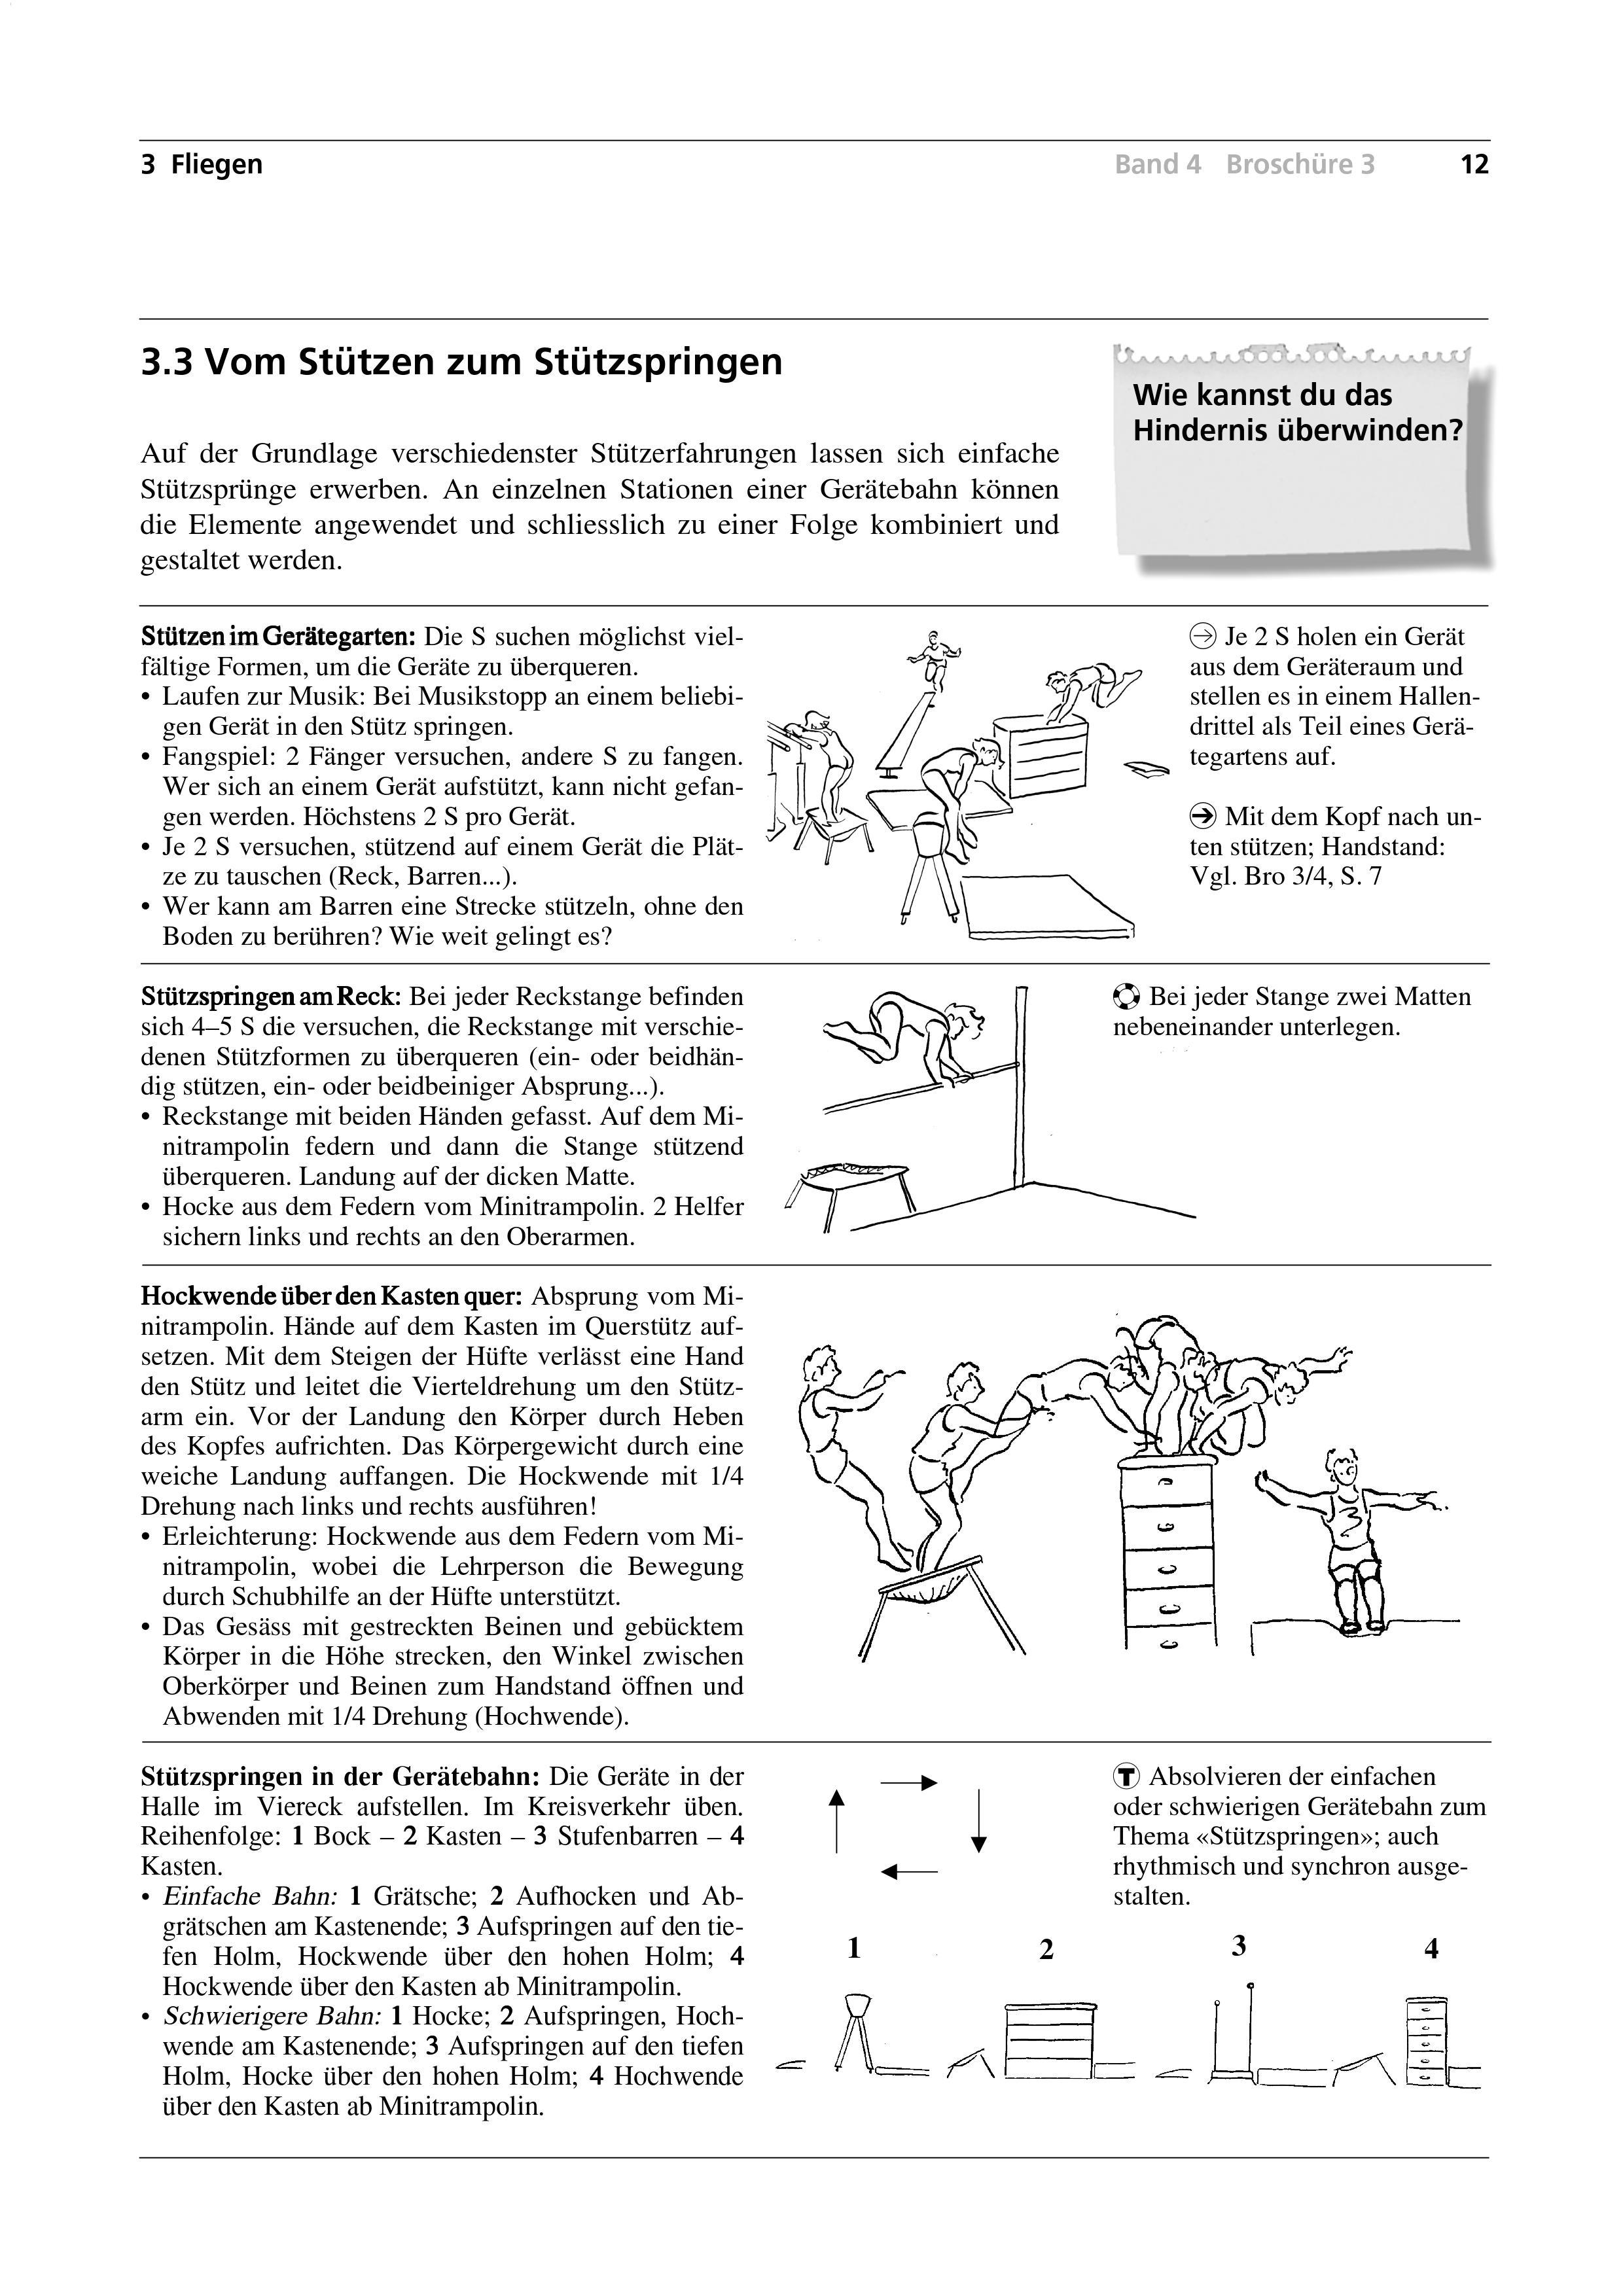 Preview image for LOM object Vom Stützen zum Stützspringen